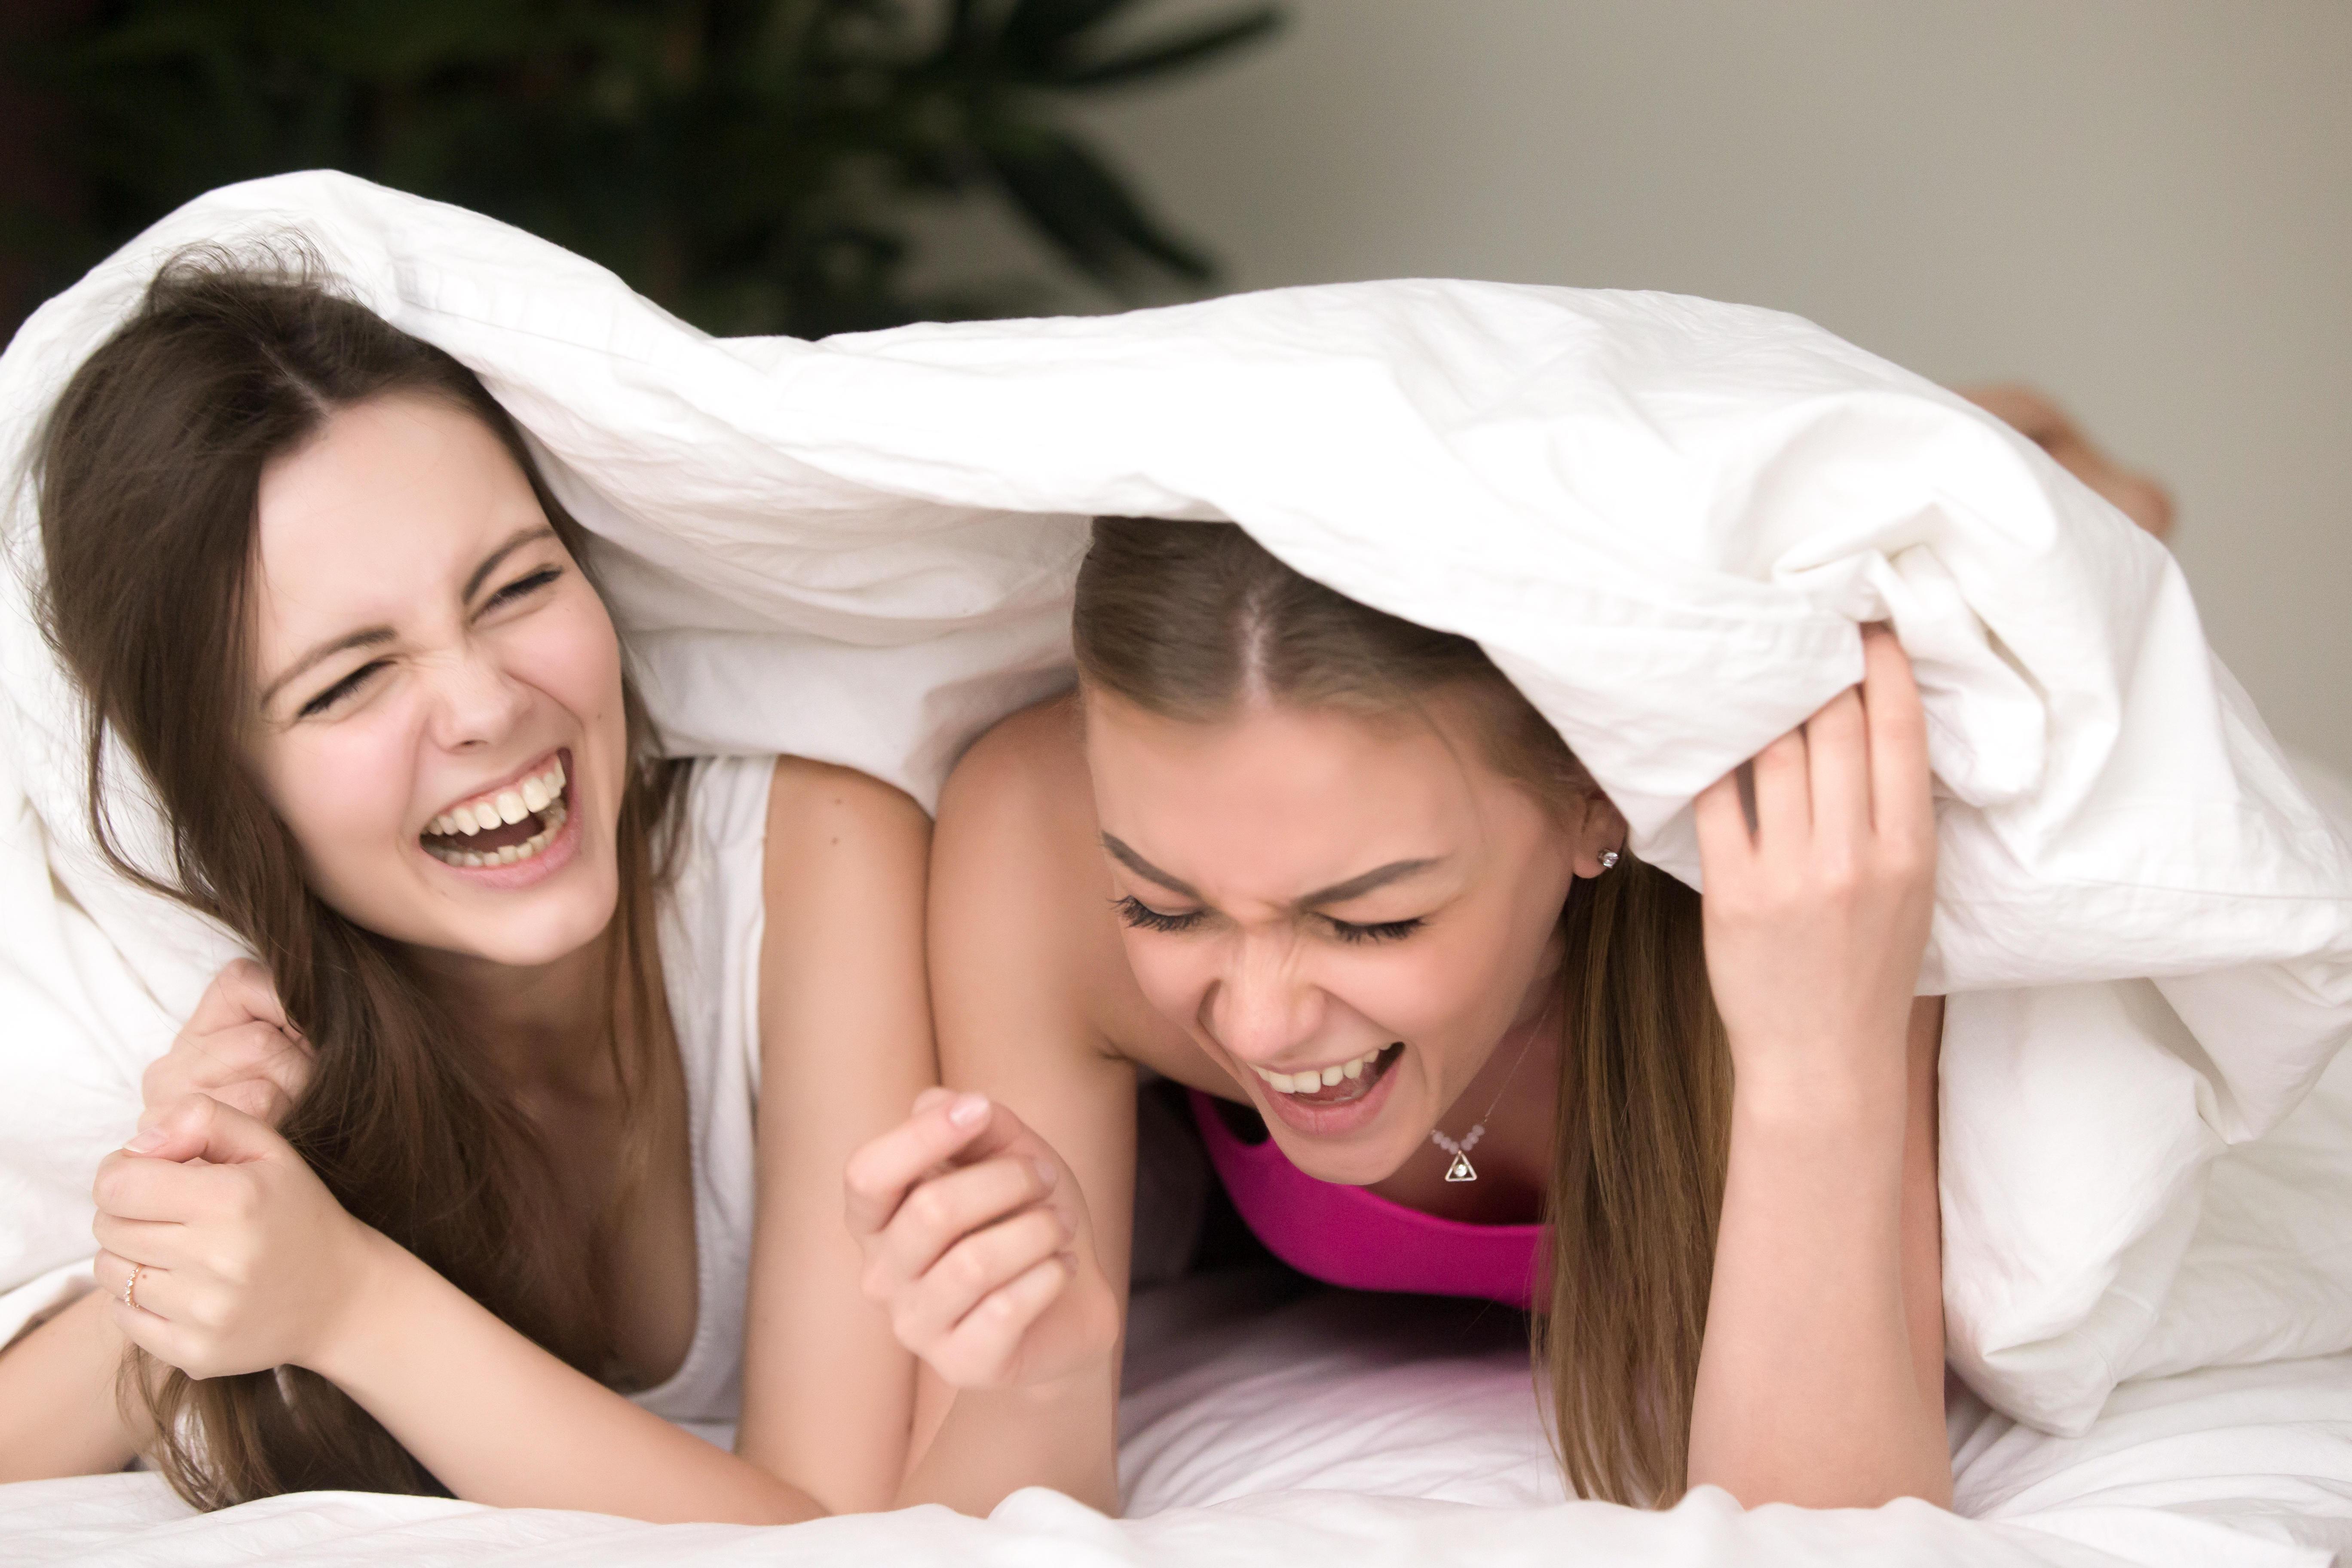 veninder, hygge, pyjamas party, afslapning, grin, sjov